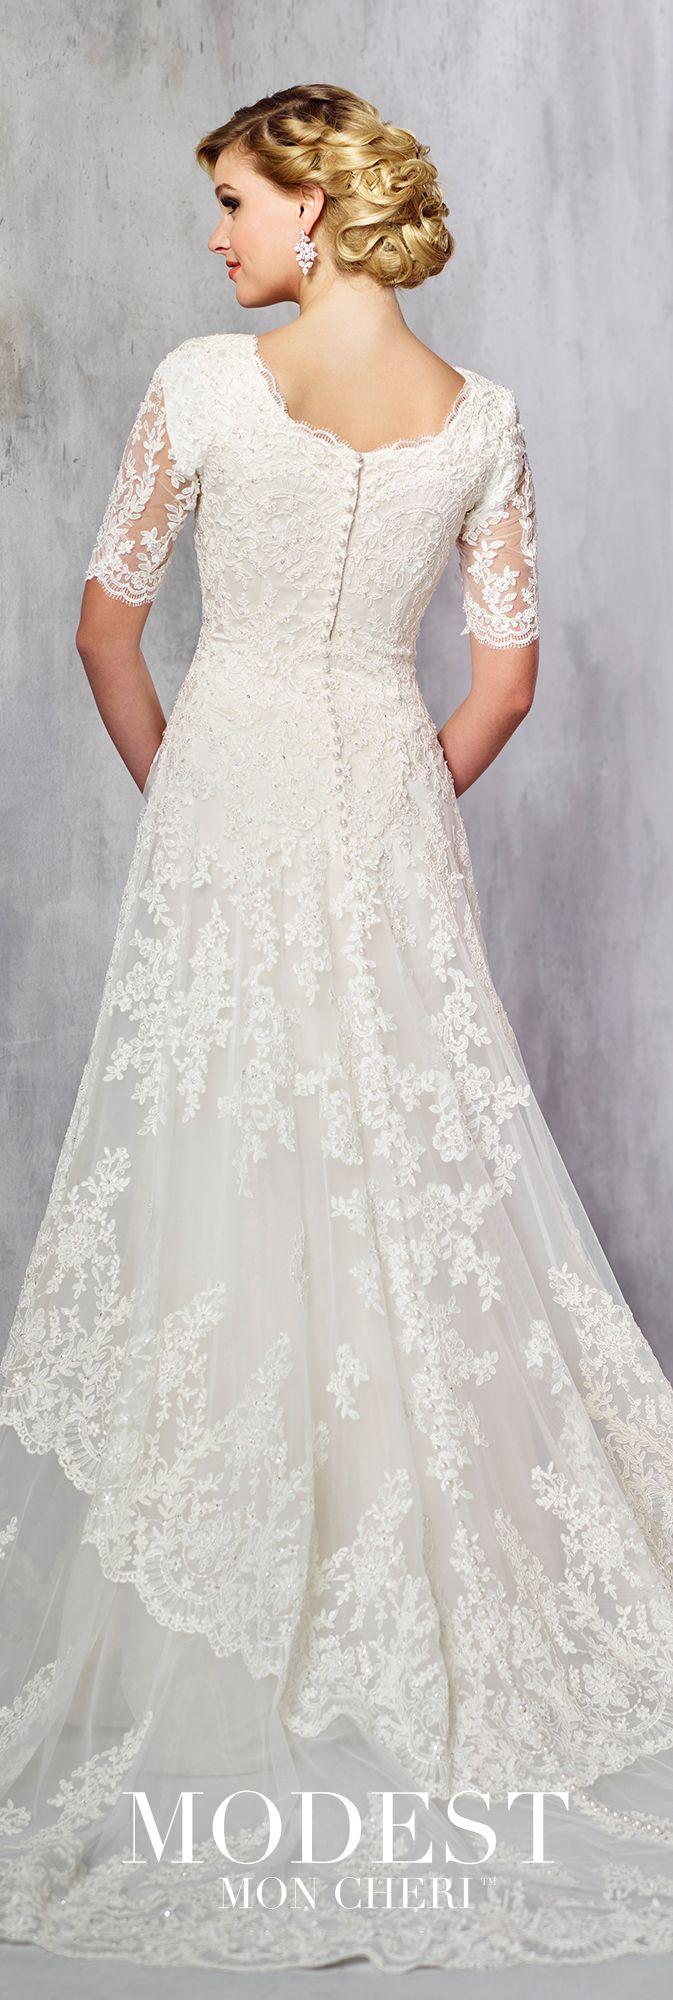 Modest Wedding Dresses Modest By Mon Cheri Modest Wedding Dresses Short Wedding Dress Trendy Wedding Dresses [ 2000 x 673 Pixel ]